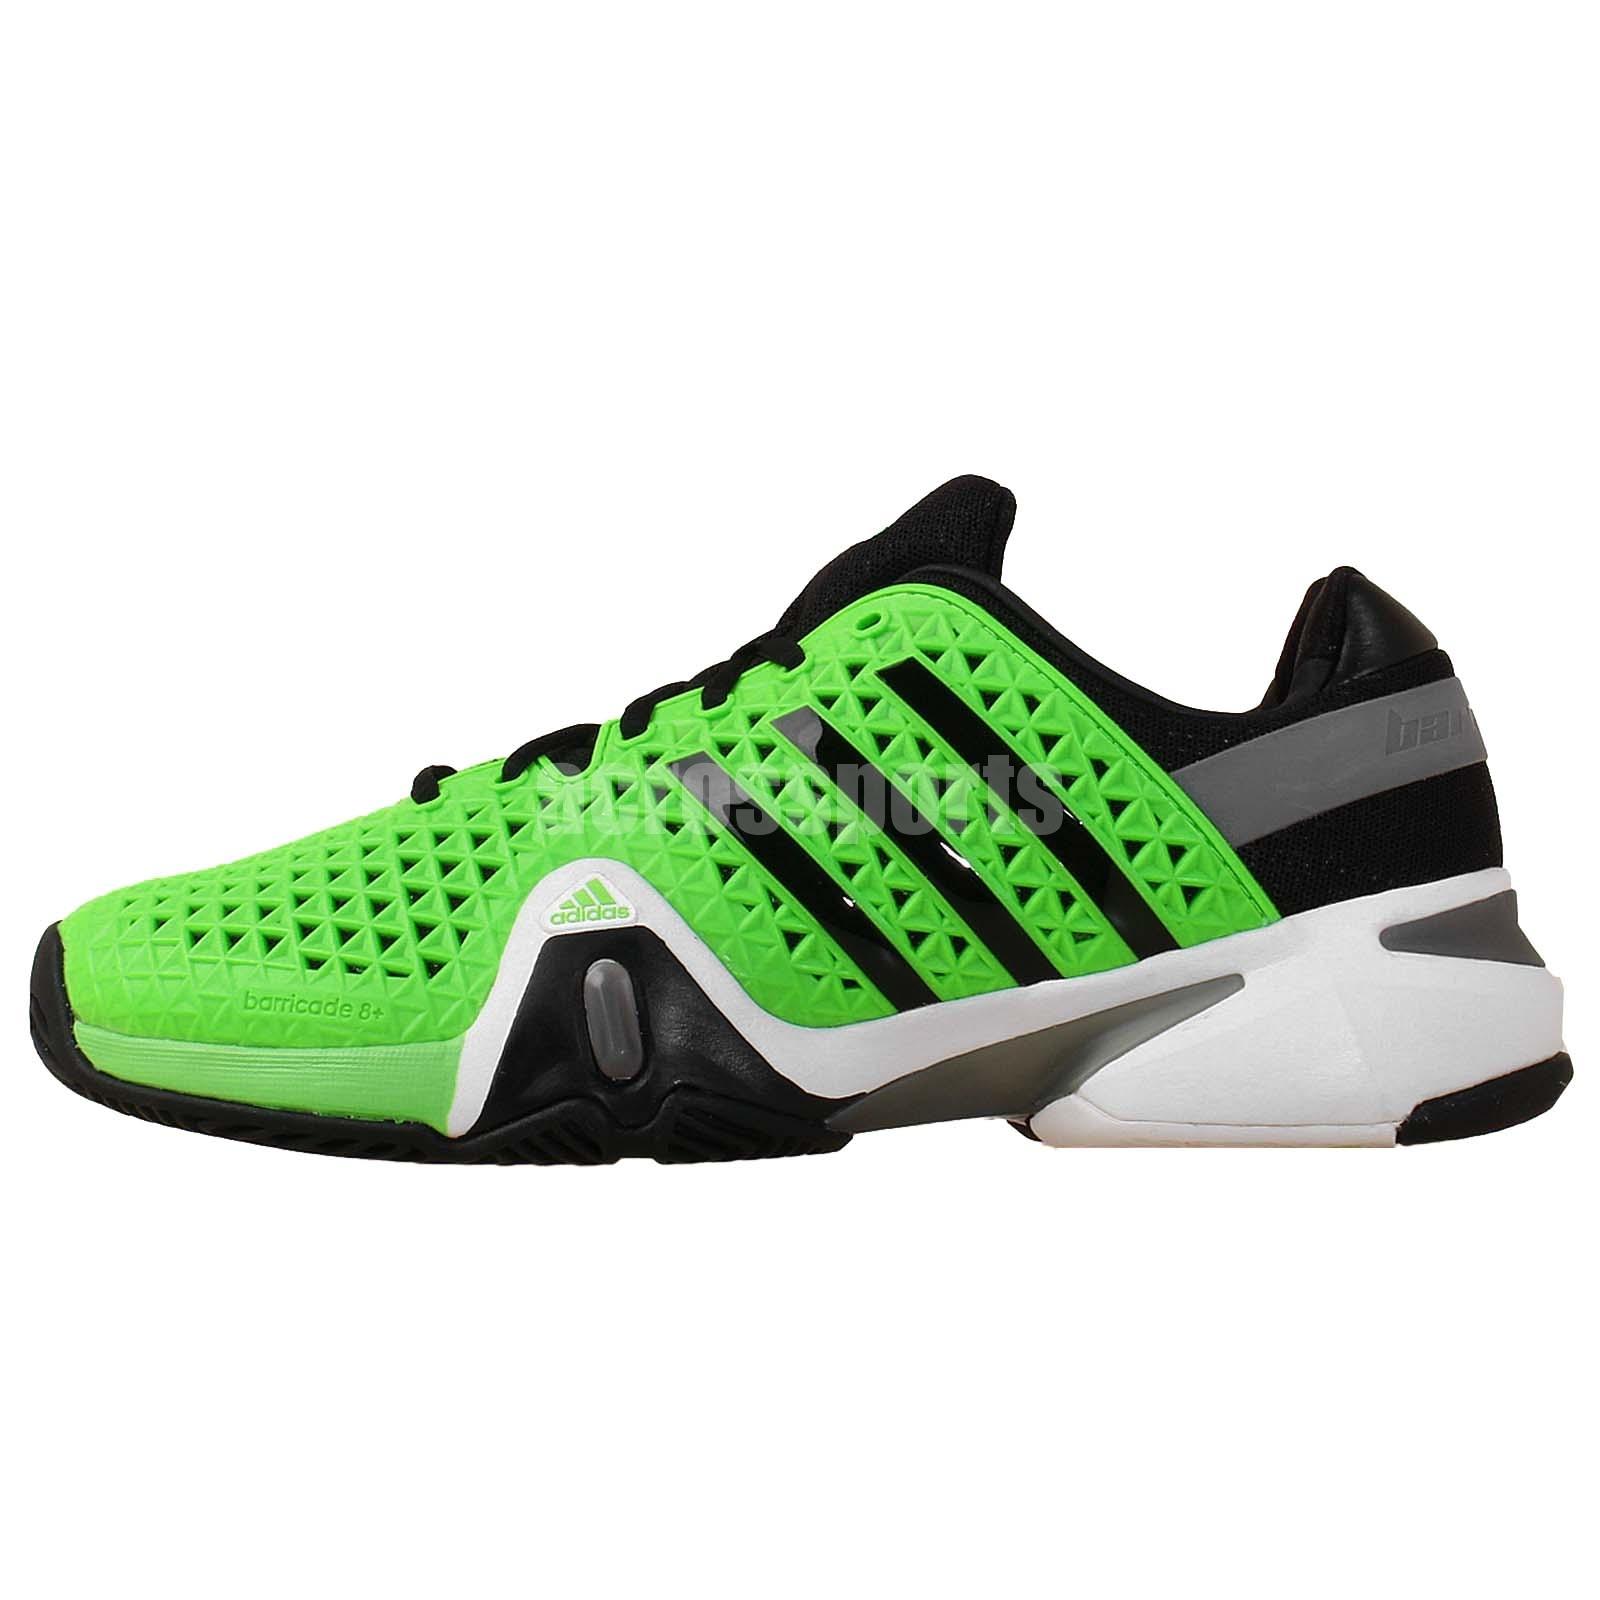 adidas adipower barricade 8 viii green black 2014 mens